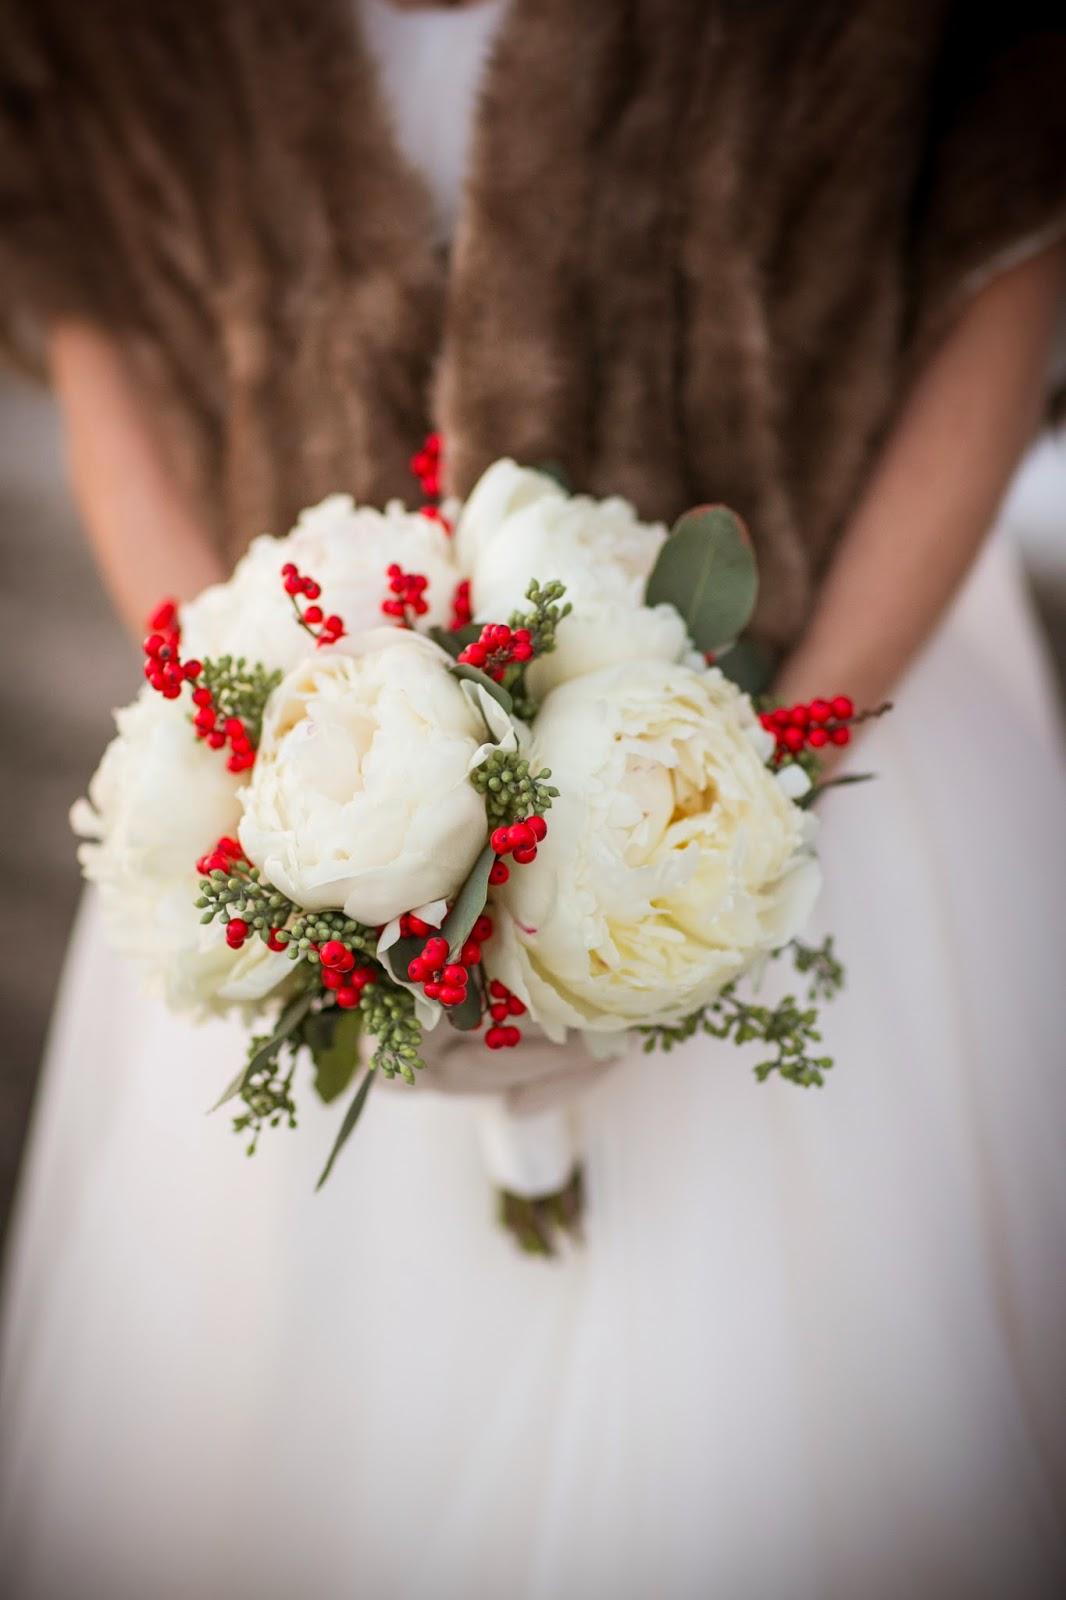 white peony & ilex berry bouquet : winter wedding : les fleurs : zev fisher photography : willowdale estate